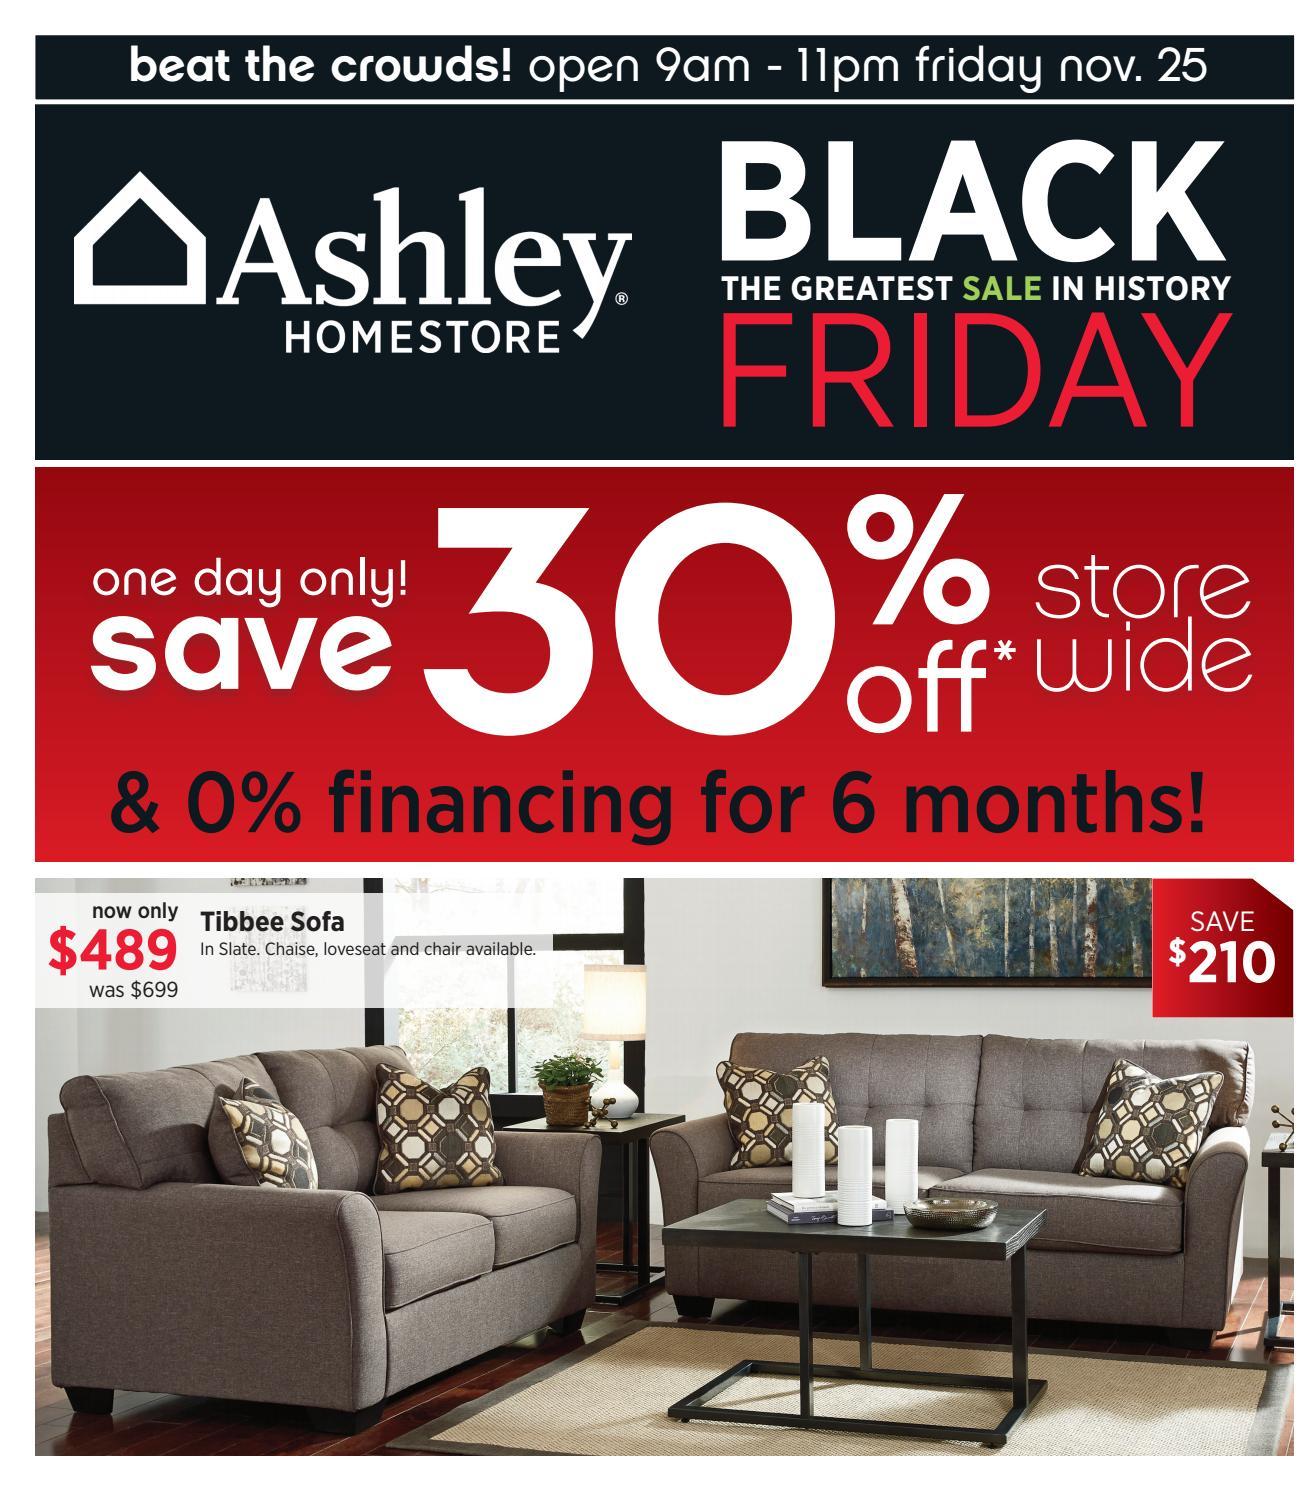 Ashley Homestore Black Friday Dartmouth Ends 25 11 16 By Ashley Homestore Atlantic Issuu